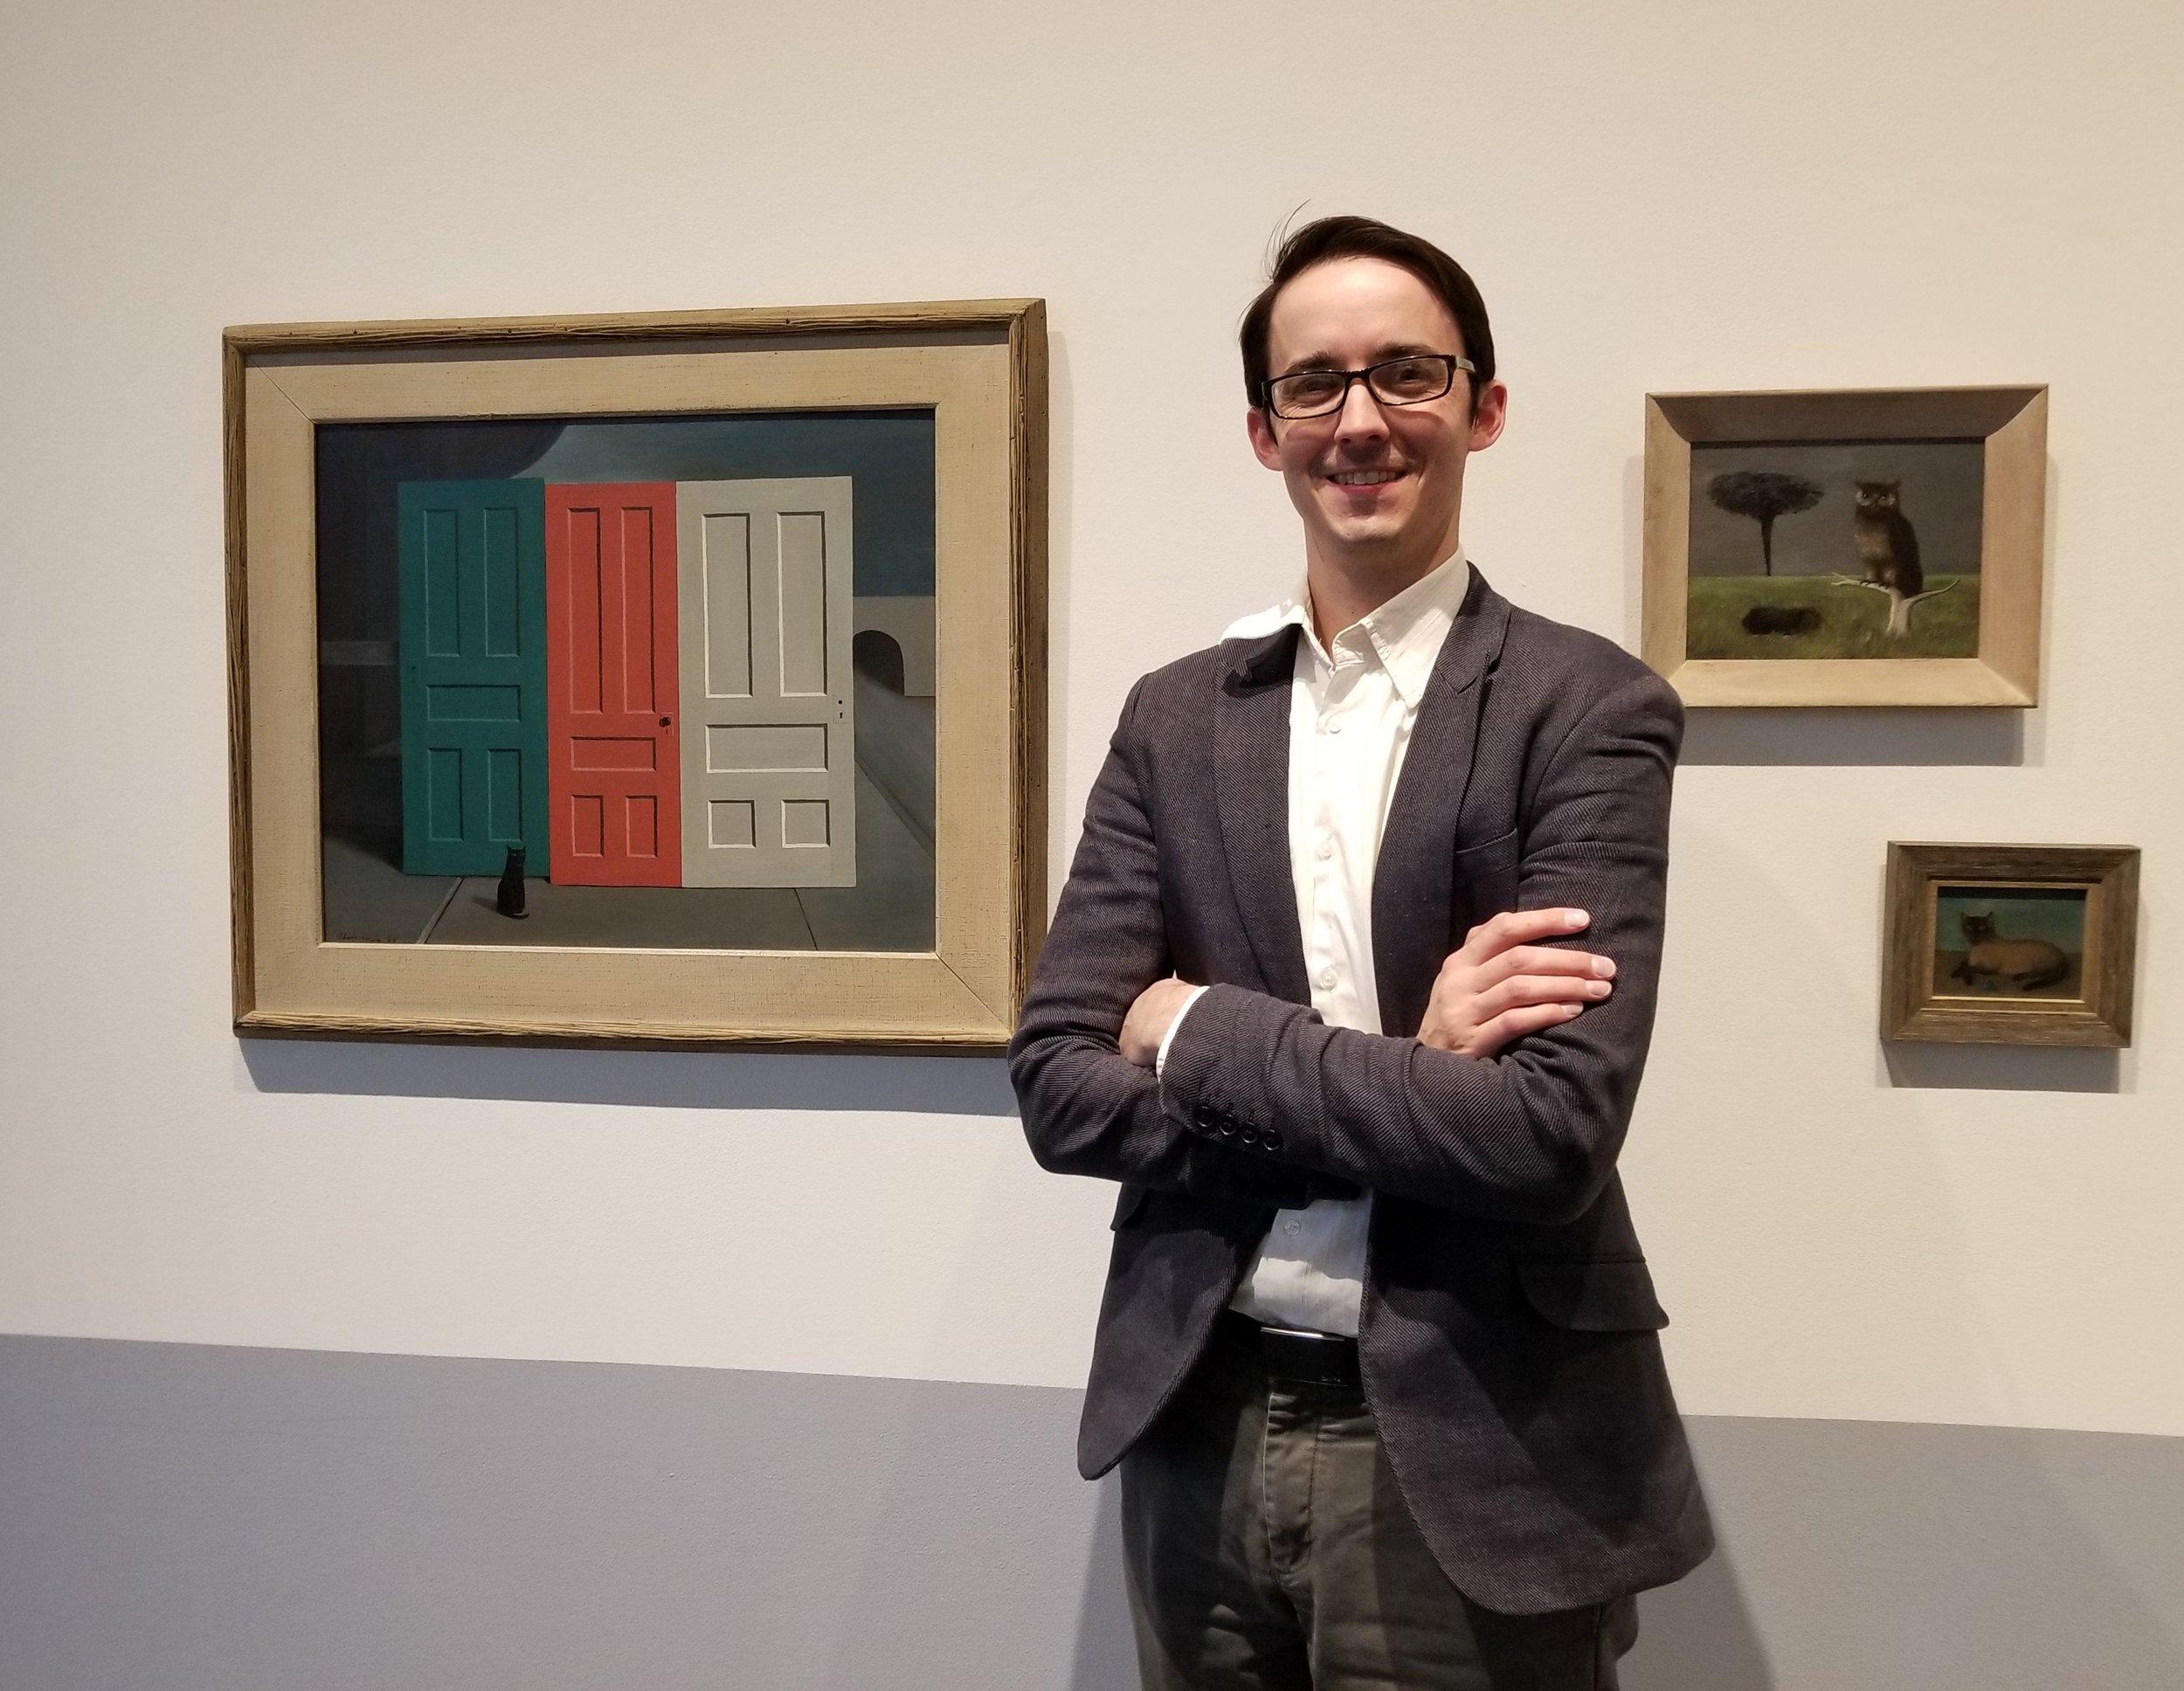 John McKinnon, executive director of the Elmhurst Art Museum